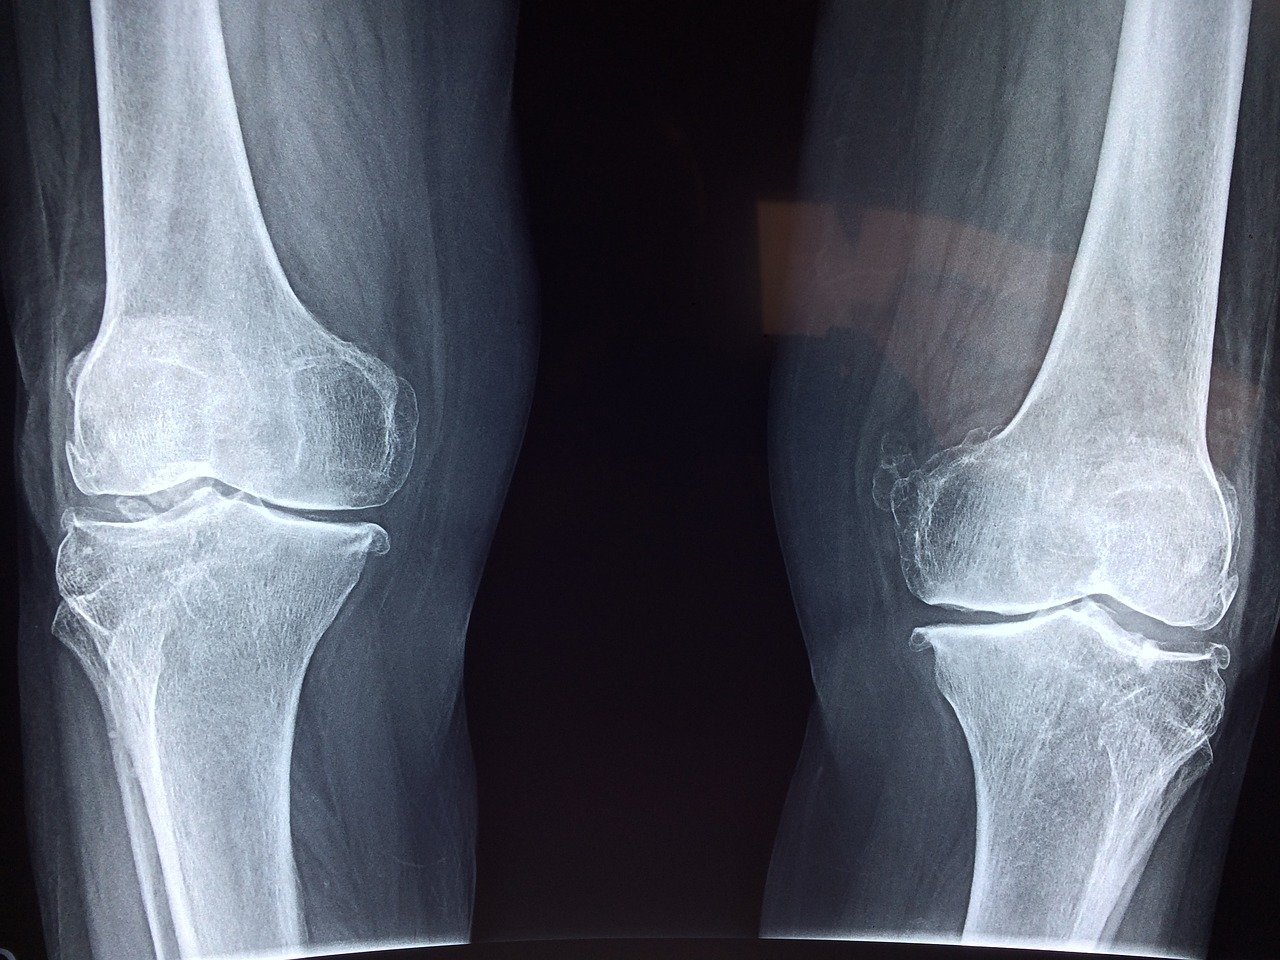 bone x-ray